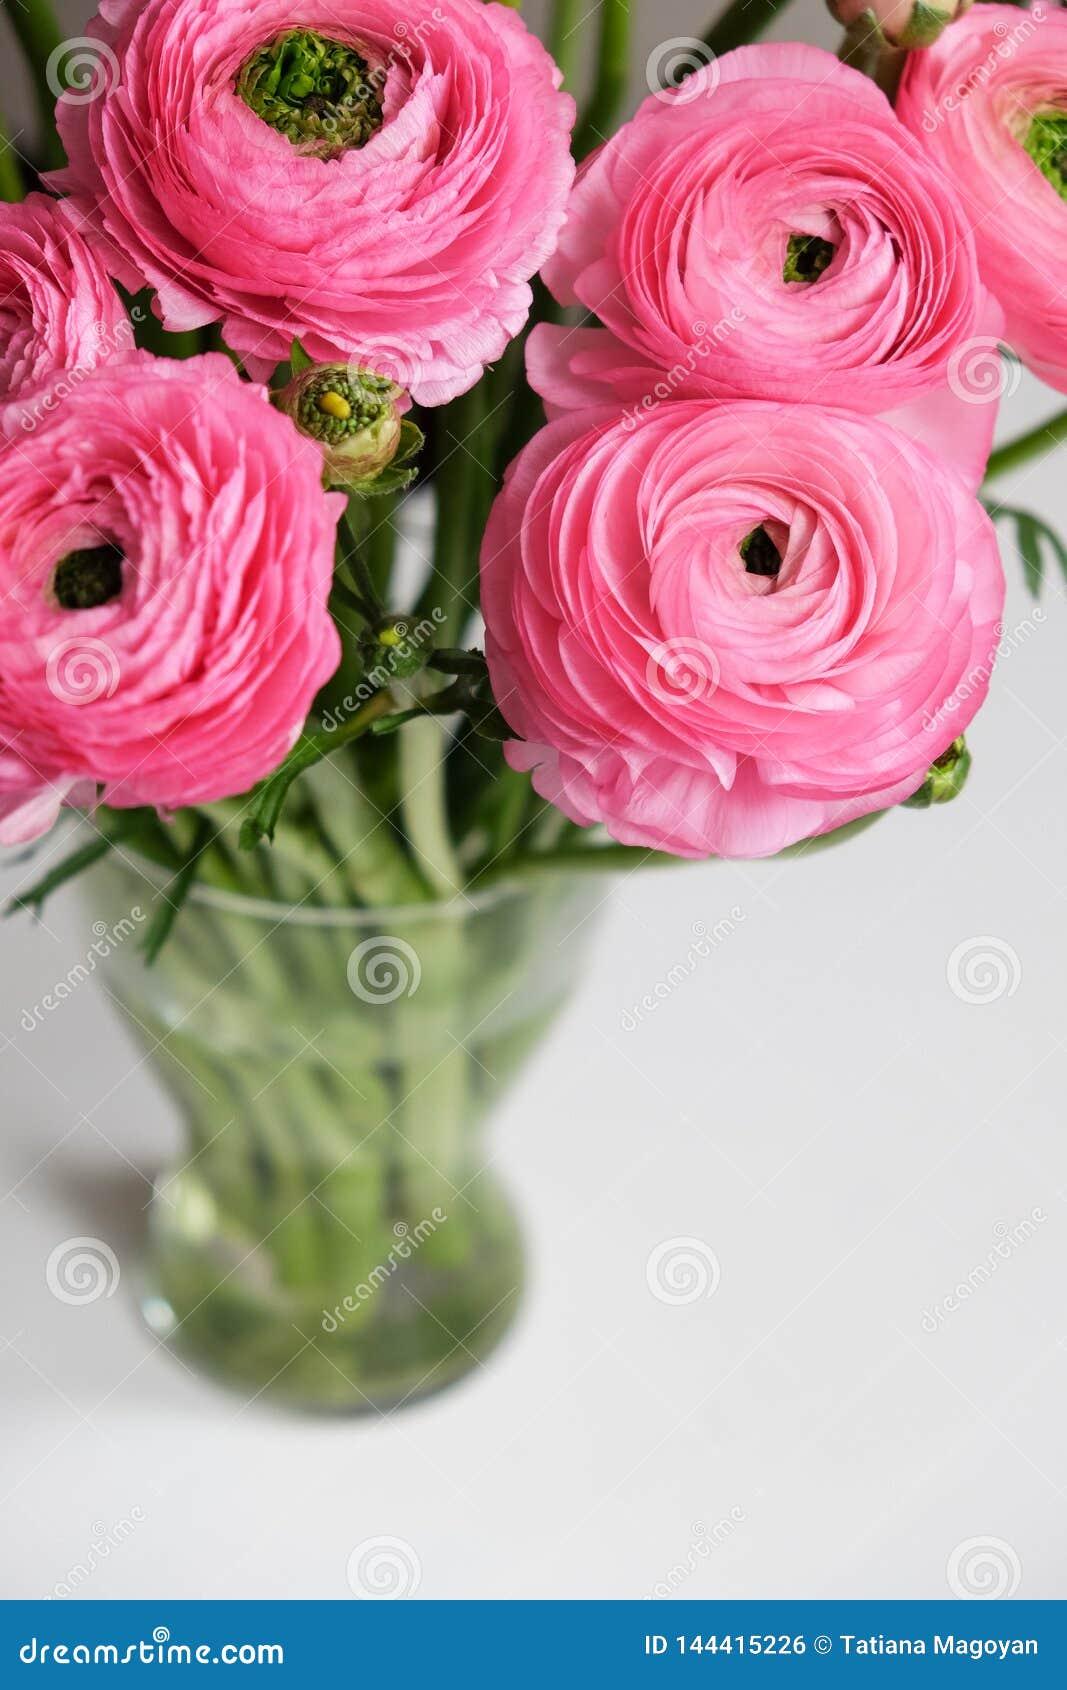 Roze Ranunculus boeket in transparante glasvaas op witte lijst Close-up Voor kleurrijke groetkaart, bloemlevering